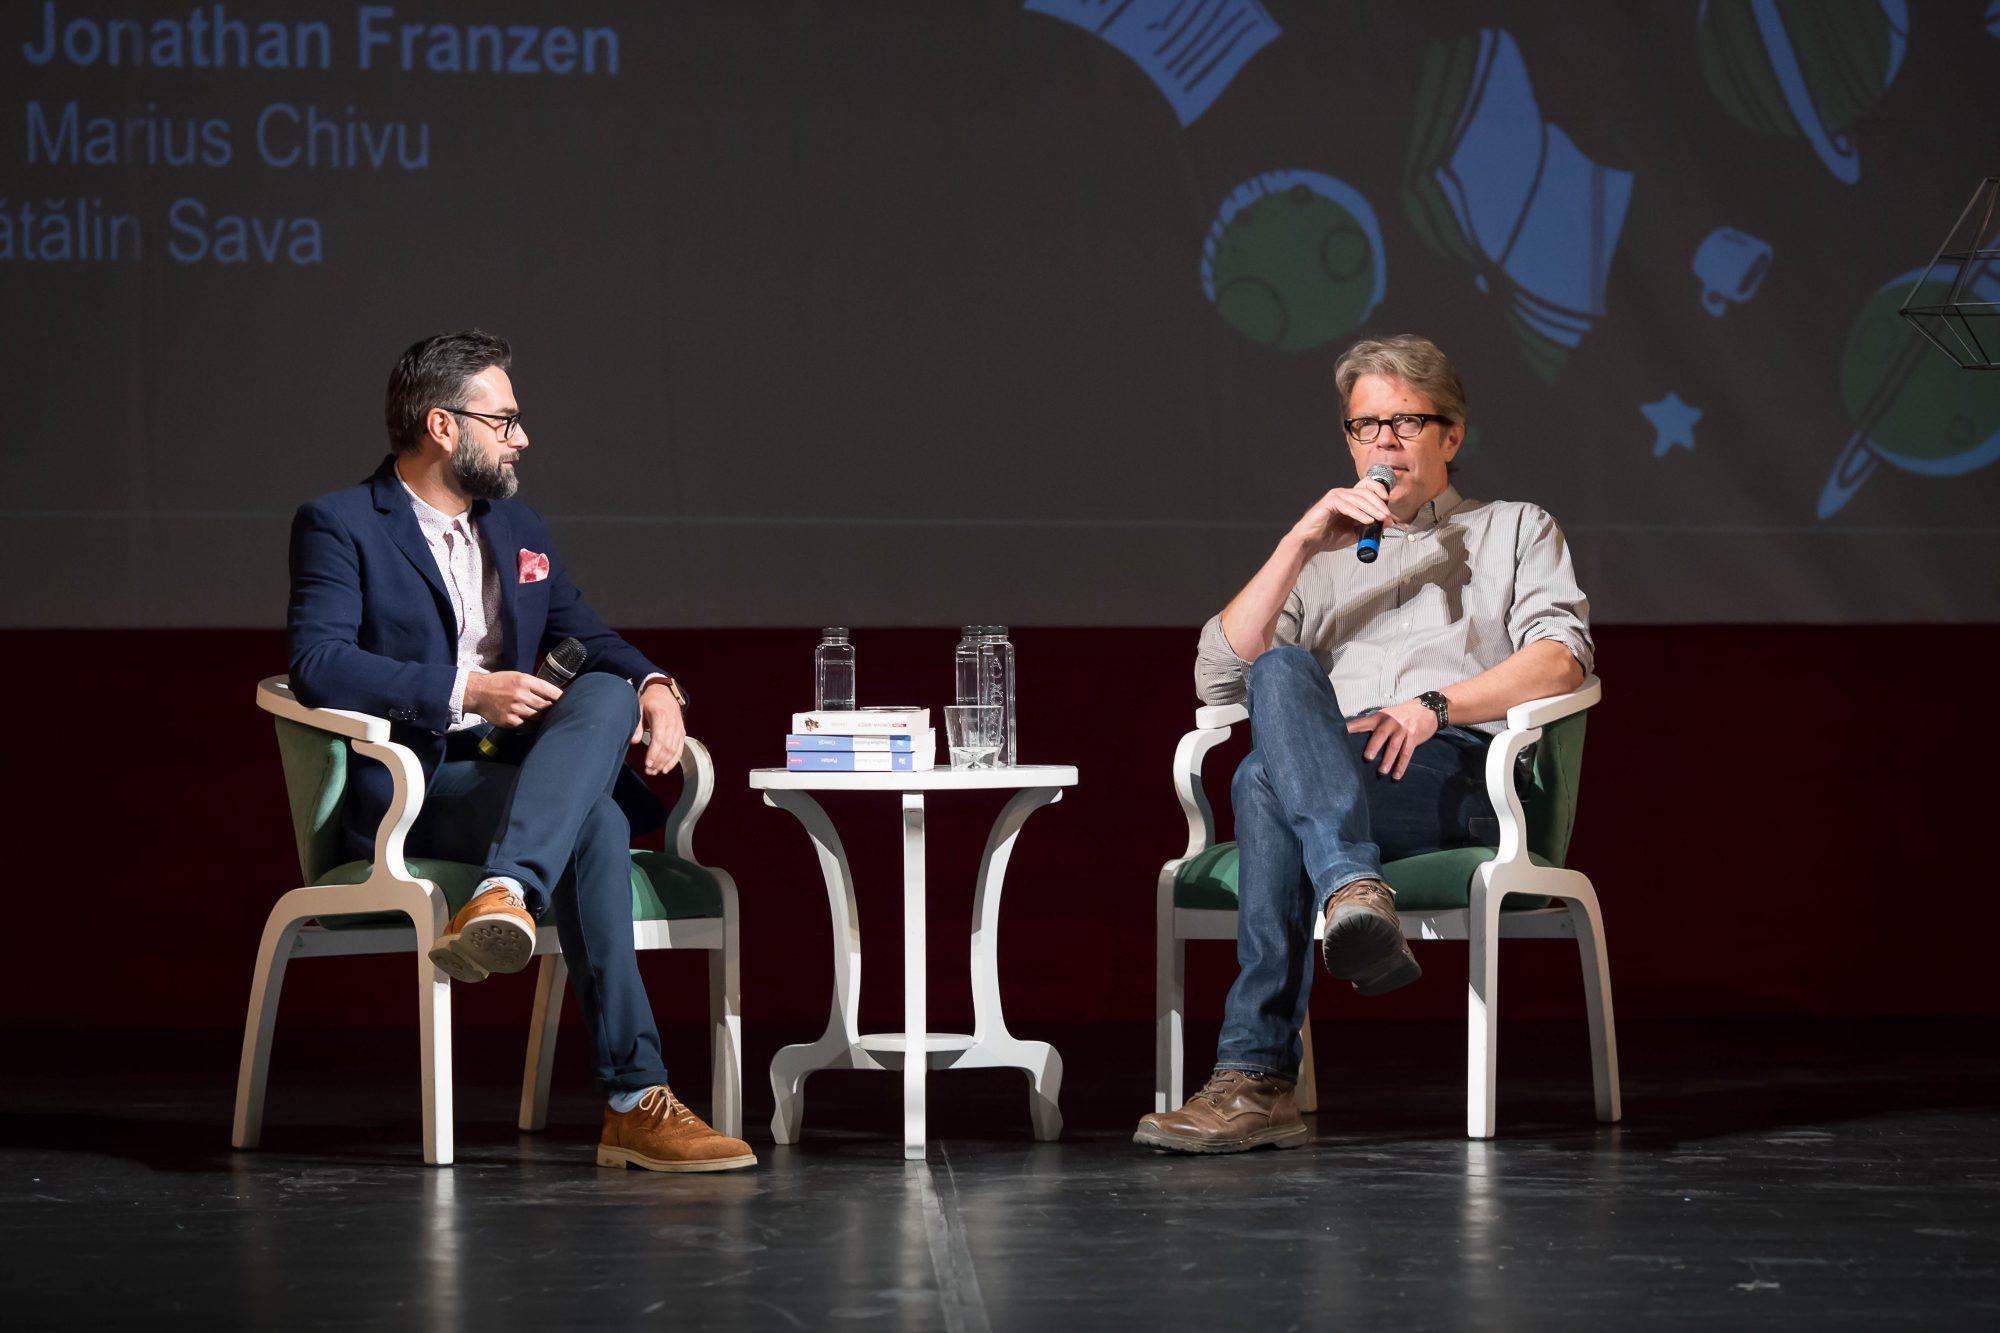 Jonathan Franzen și Marius Chivu la FILIT